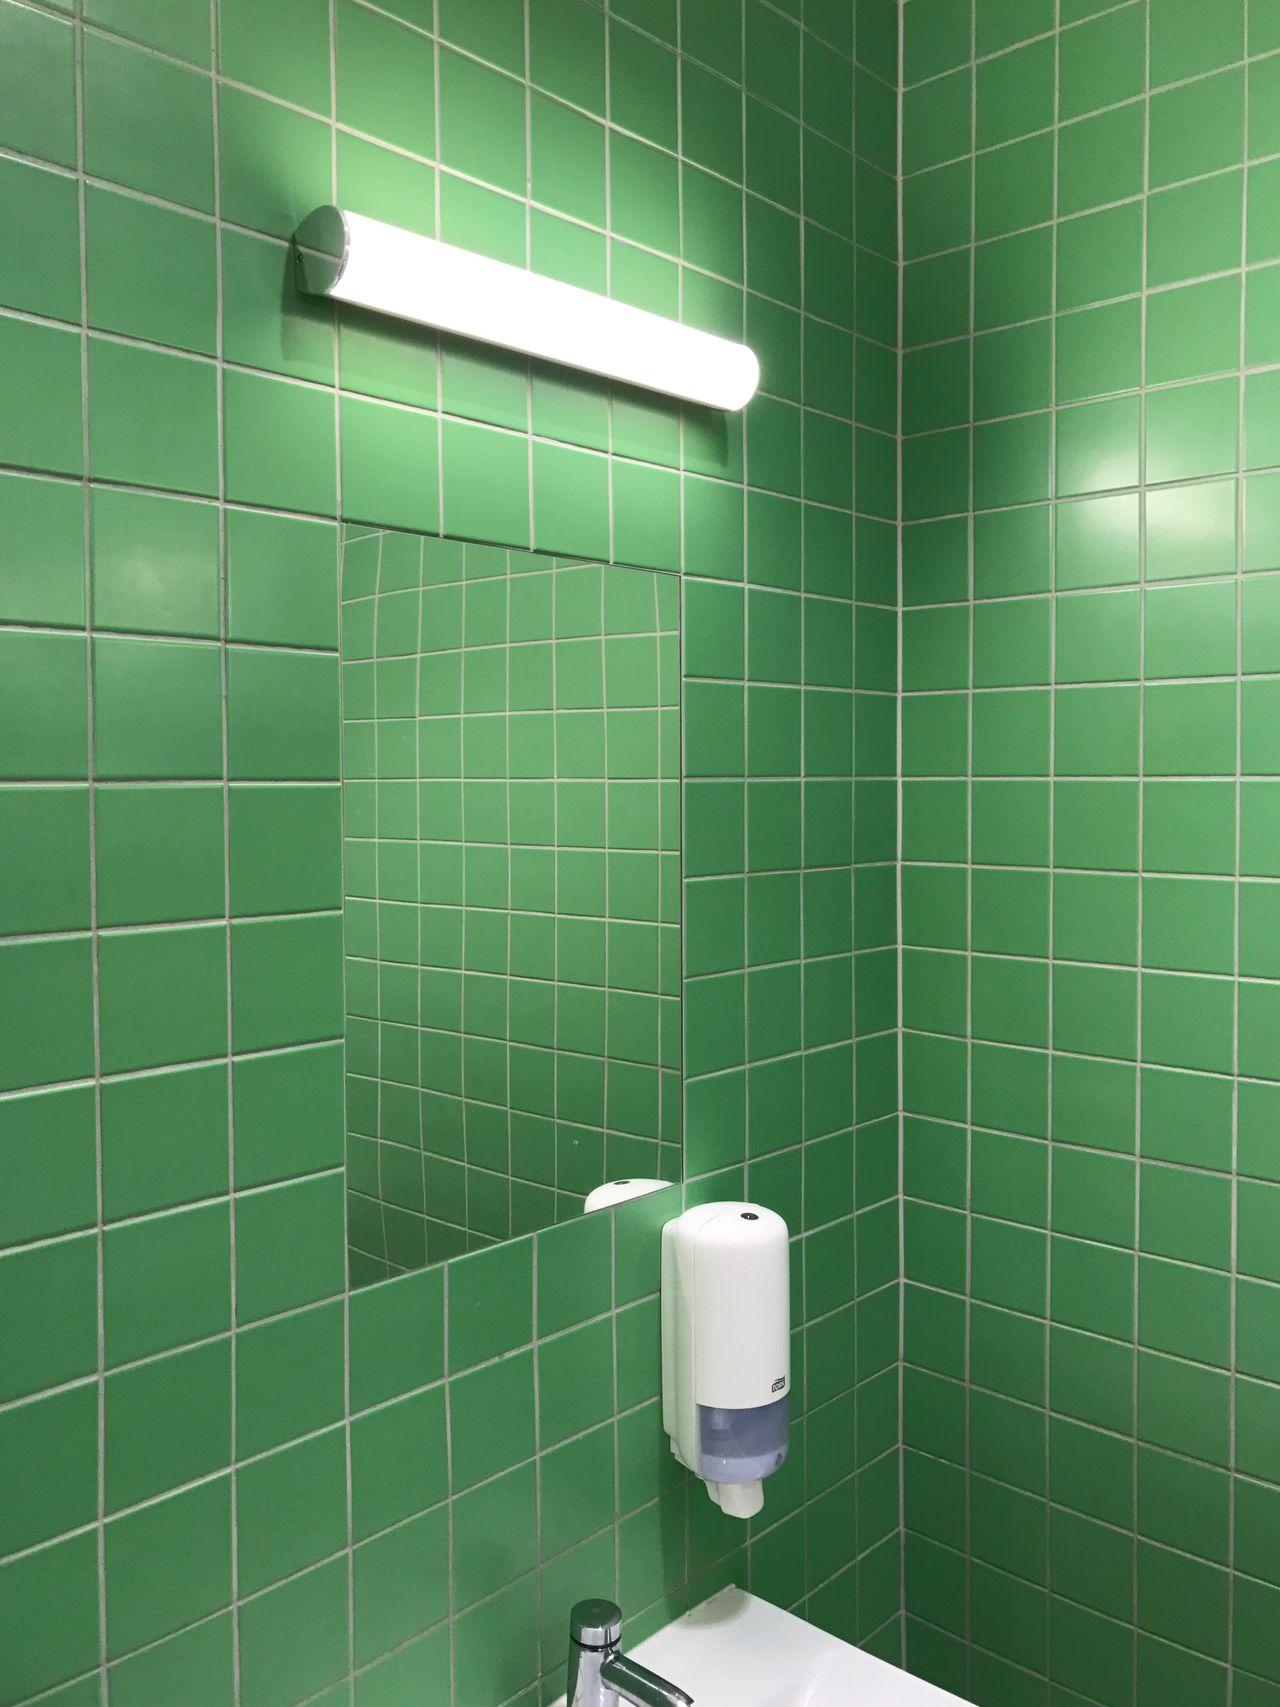 Tile Public Restroom Bathroom Public Building Indoors  Green Color Urinal No People IKEA Restroom Minimalism Interior Minimal Aesthetics Aesthetic Minimalistic Empty Tiles Mirror Neon Texture Green Toilet Clean Reflection